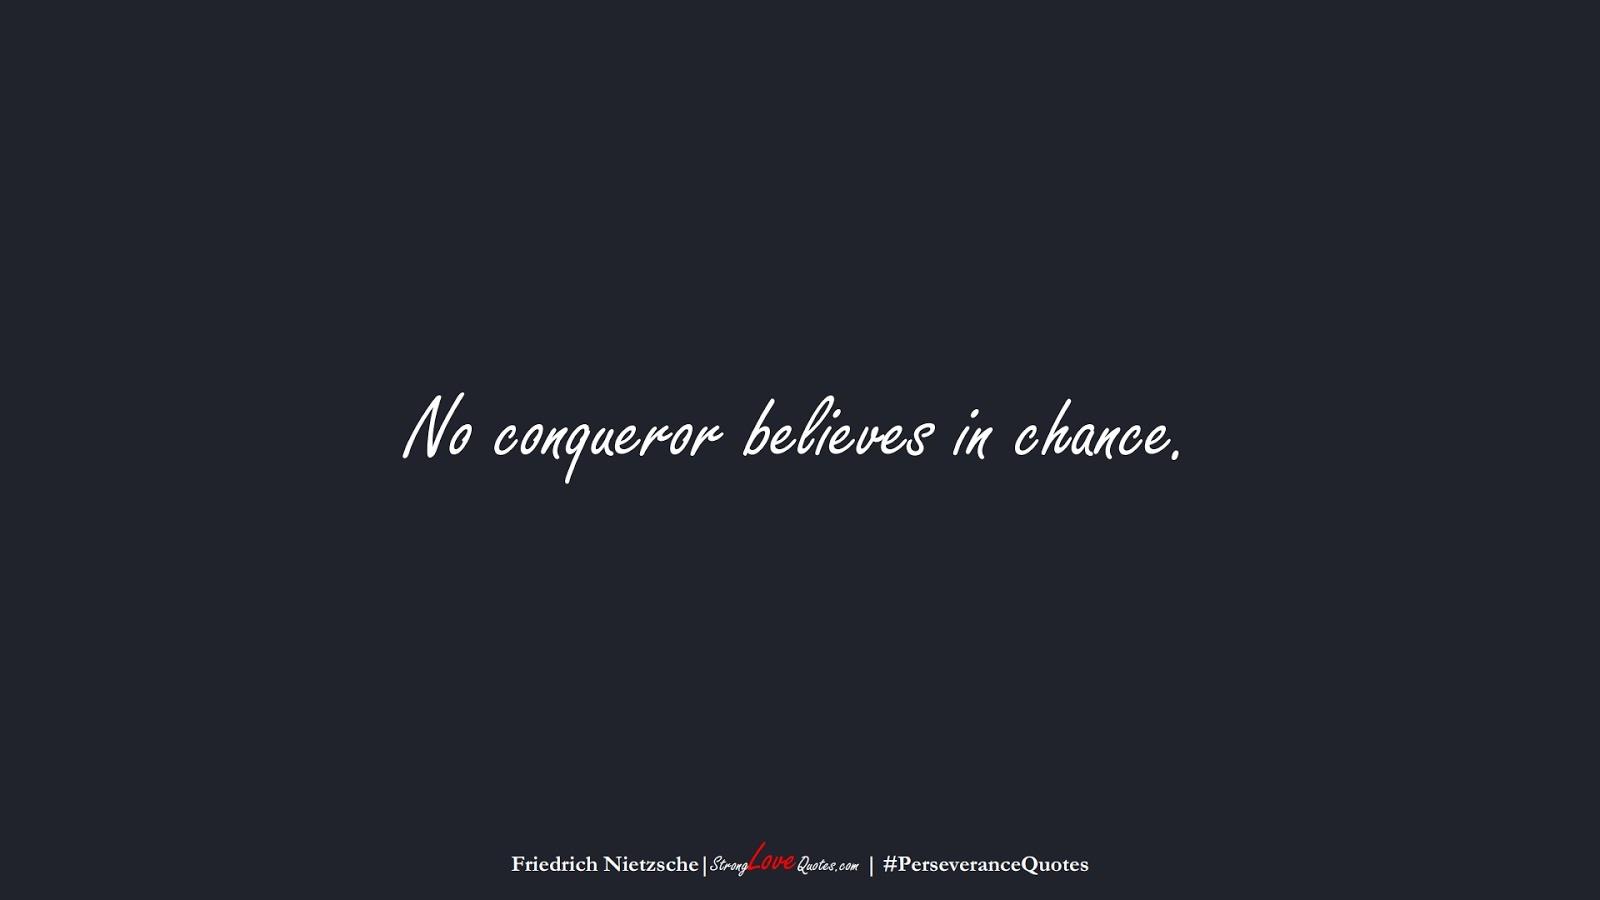 No conqueror believes in chance. (Friedrich Nietzsche);  #PerseveranceQuotes